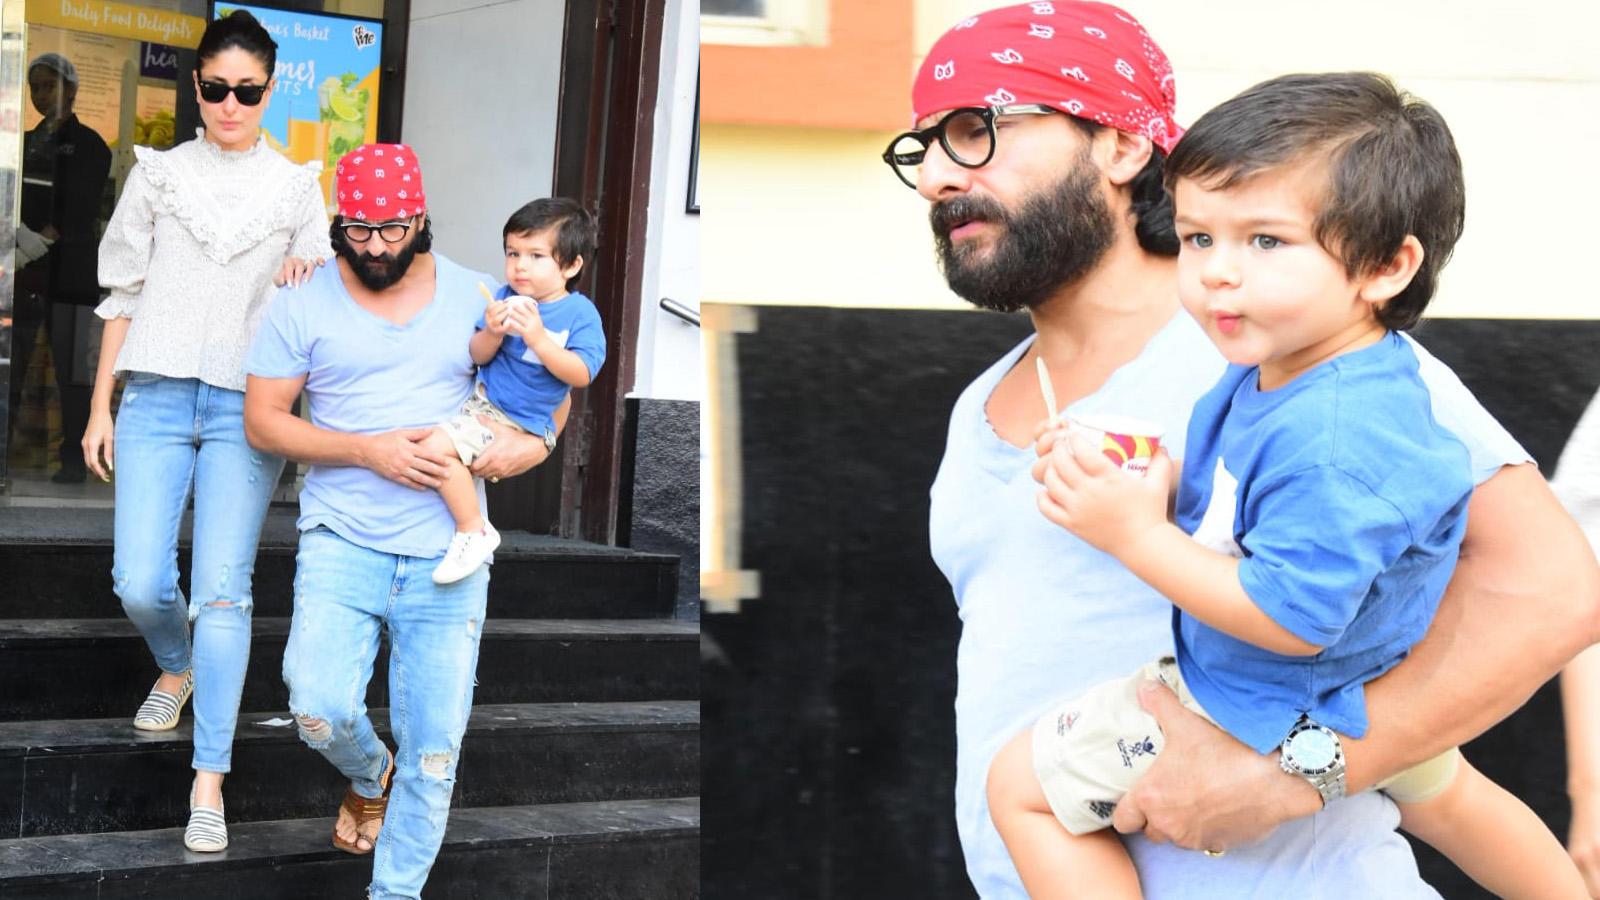 Taimur Ali Khan enjoys ice cream on outing with parents Kareena Kapoor Khan and Saif Ali Khan